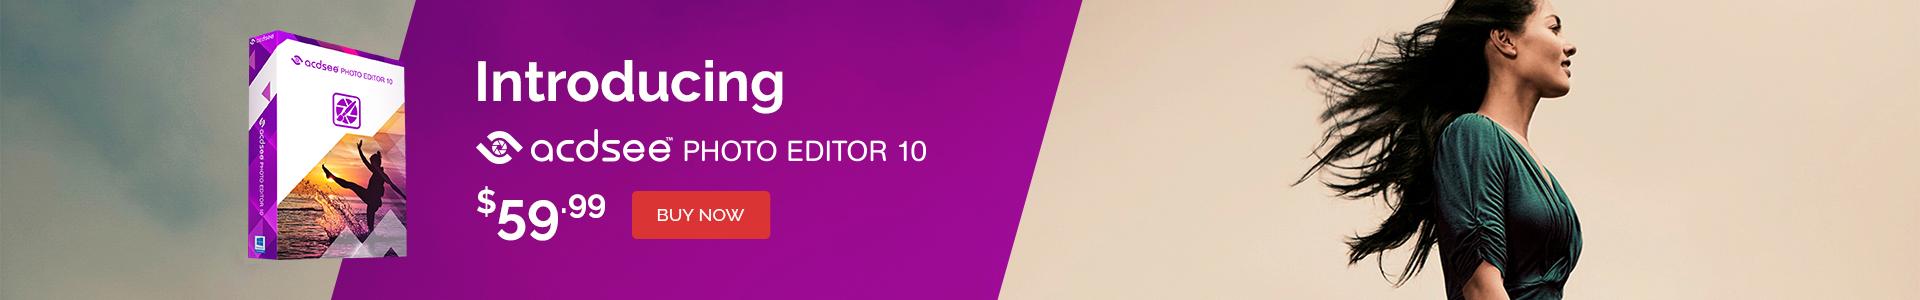 Photo Editor 10 banner